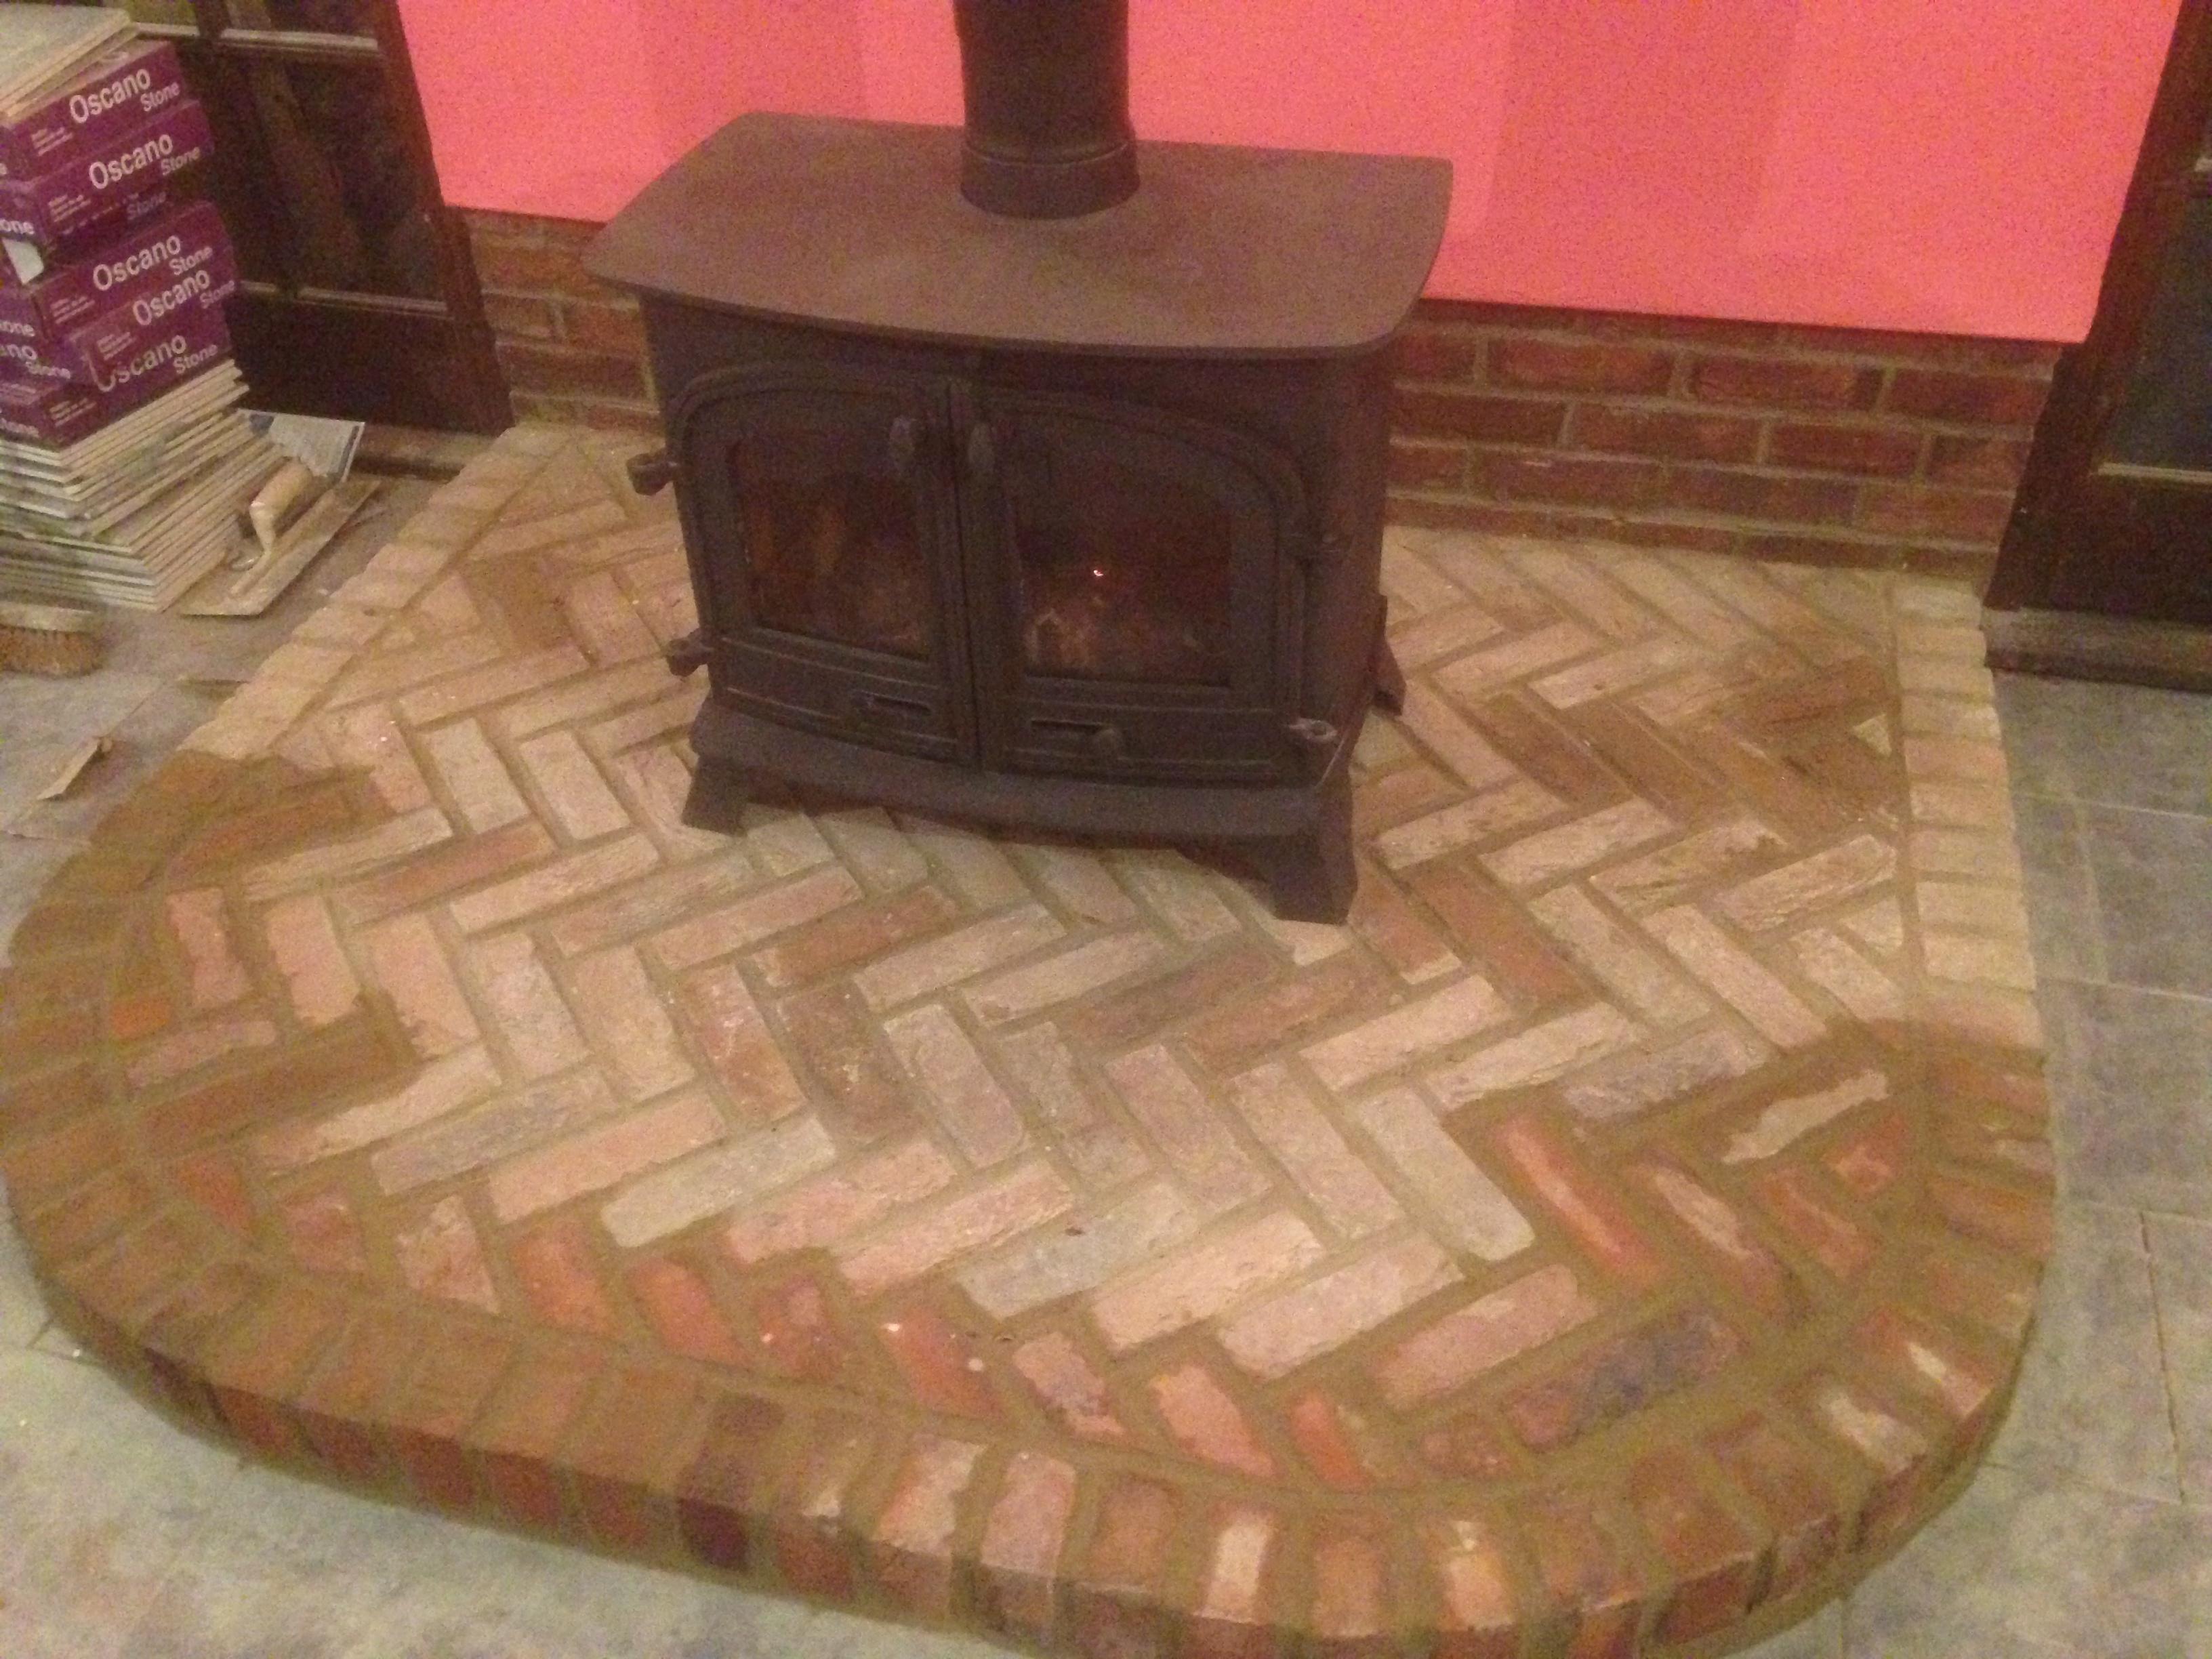 Herringbone Brick Hearth With Free Standing Stove Going To